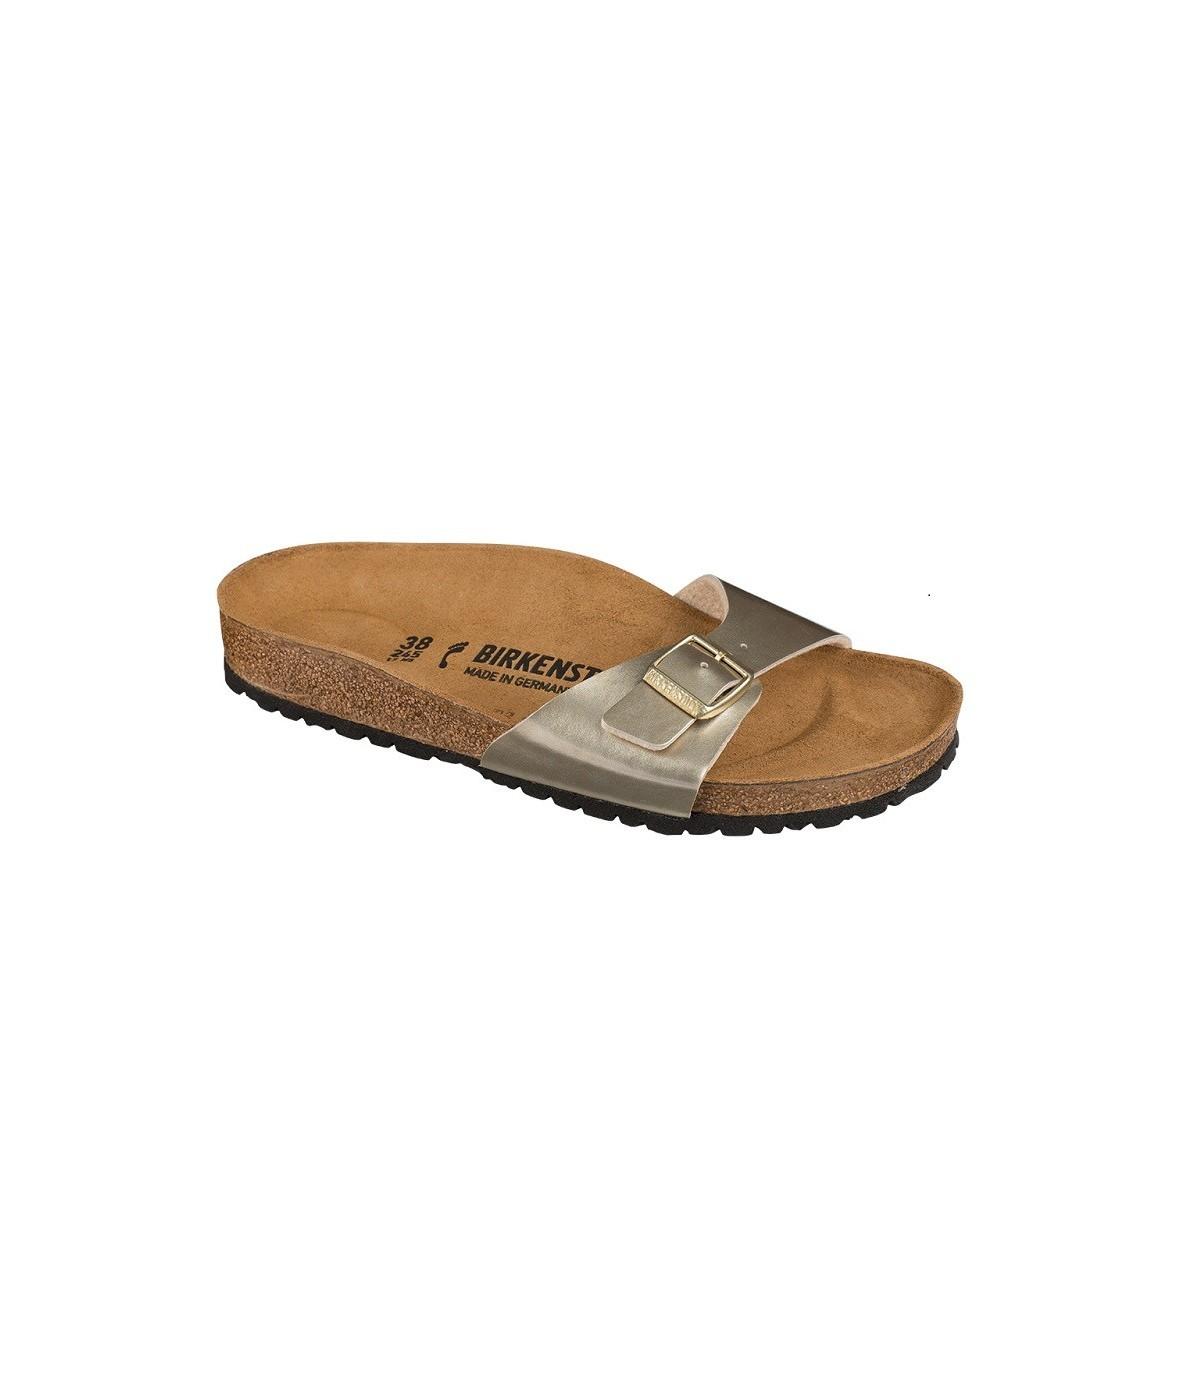 Metallic Sandale Madrid OrShowroomvip Birkenstock Soft Femme SzMpVqU